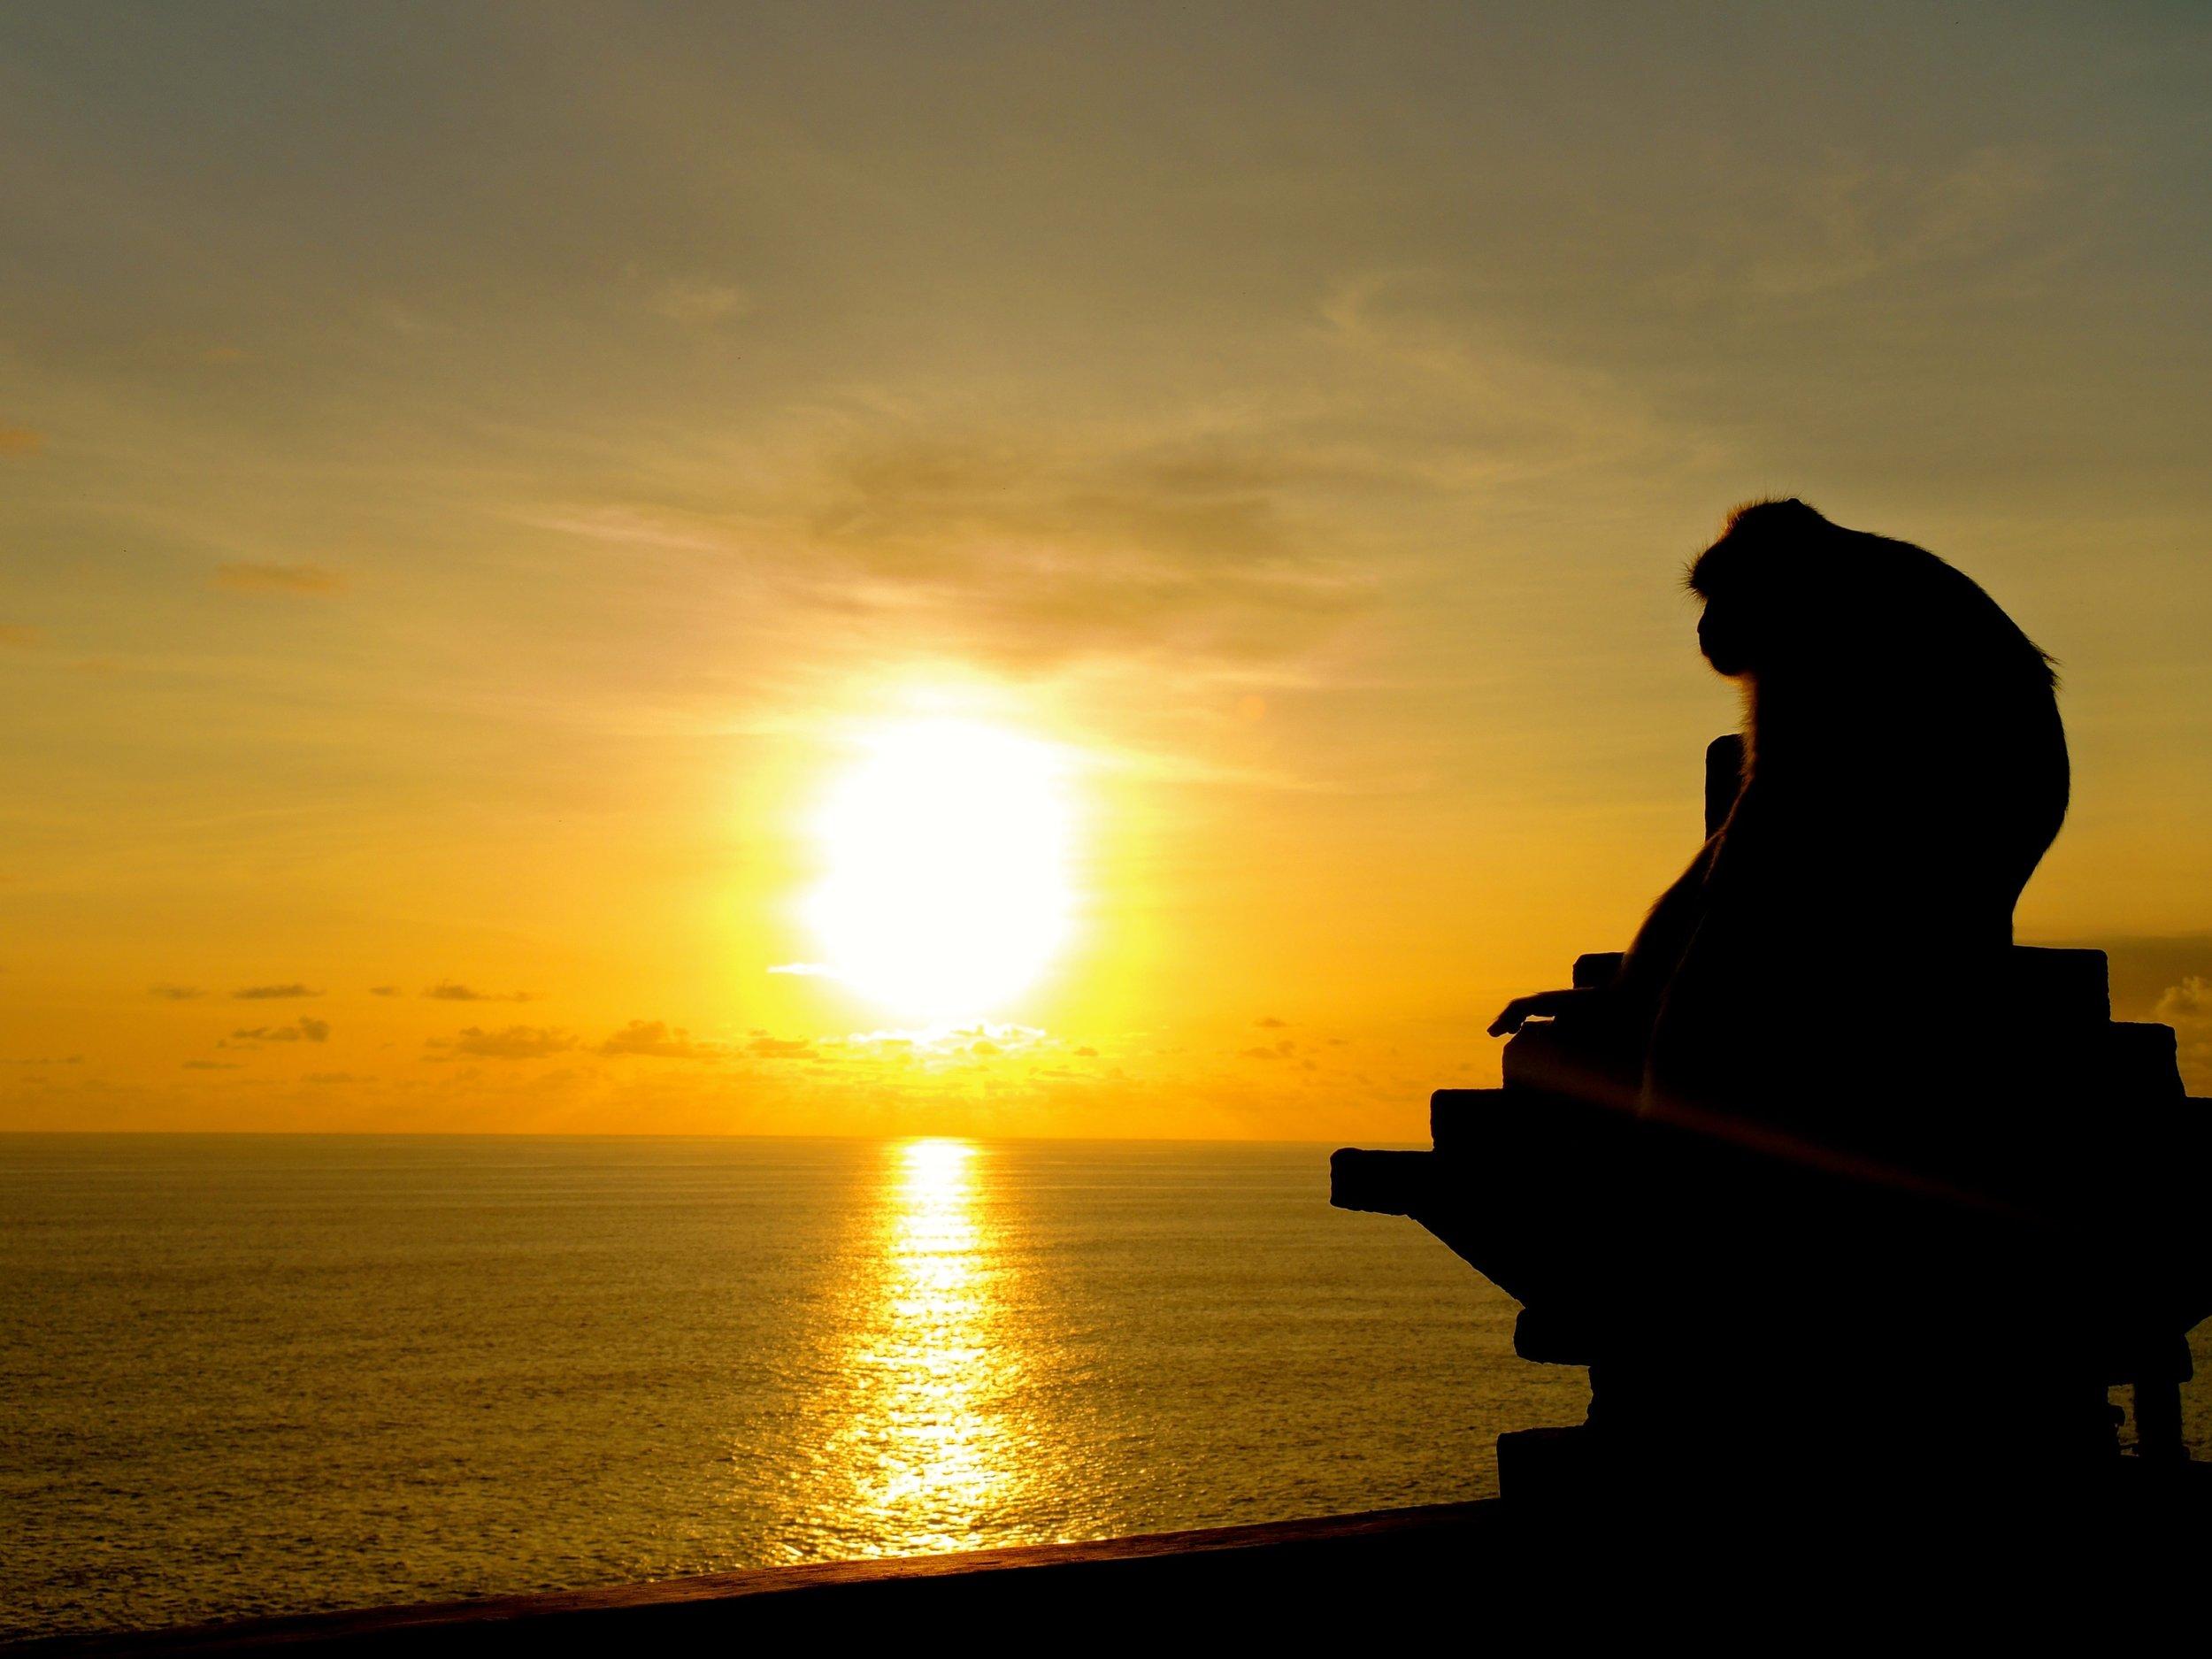 sea-water-ocean-horizon-silhouette-sun-752546-pxhere.com.jpg